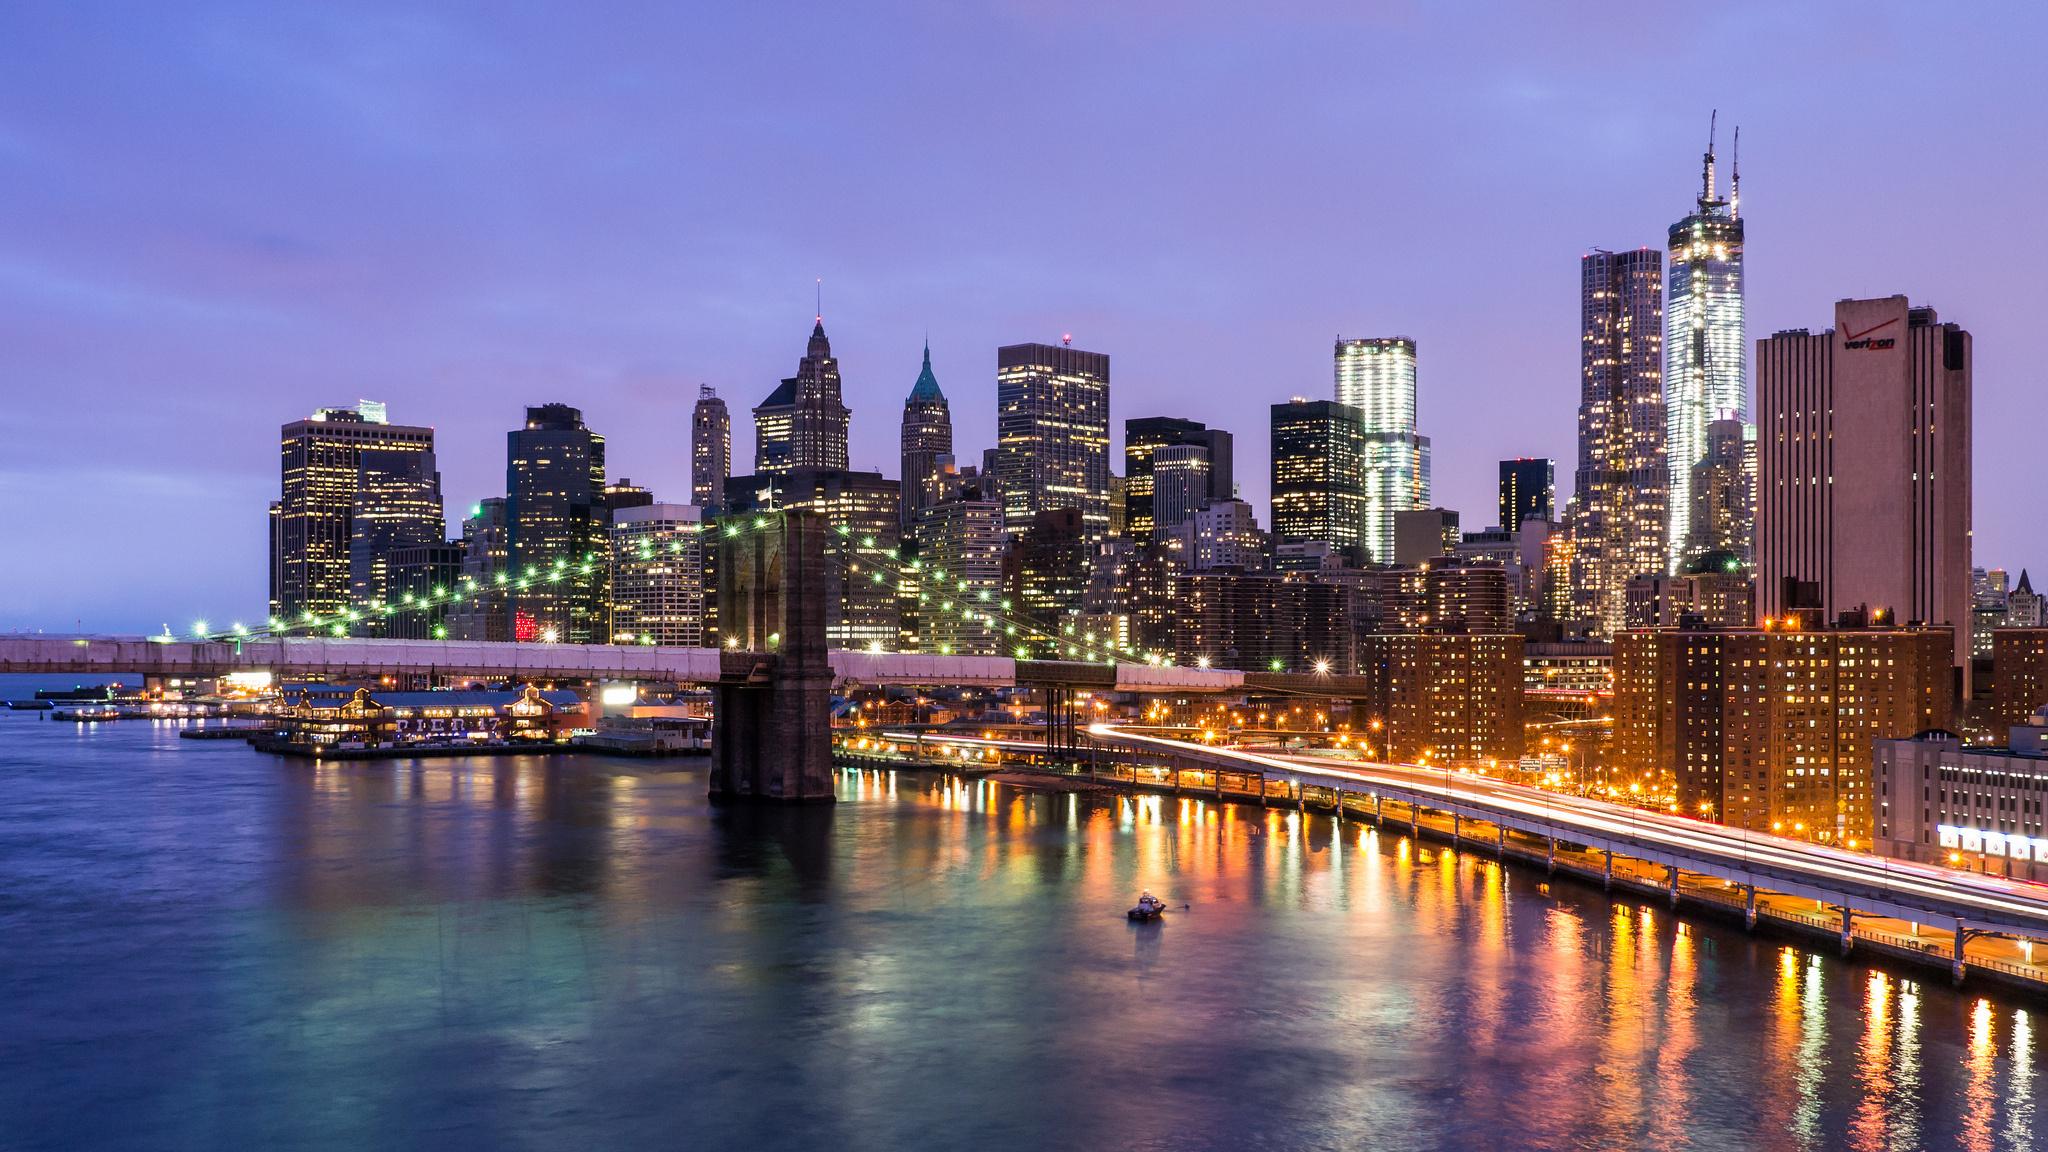 Bridge Manhattan East River New York City NYC USA New York City 2048x1152